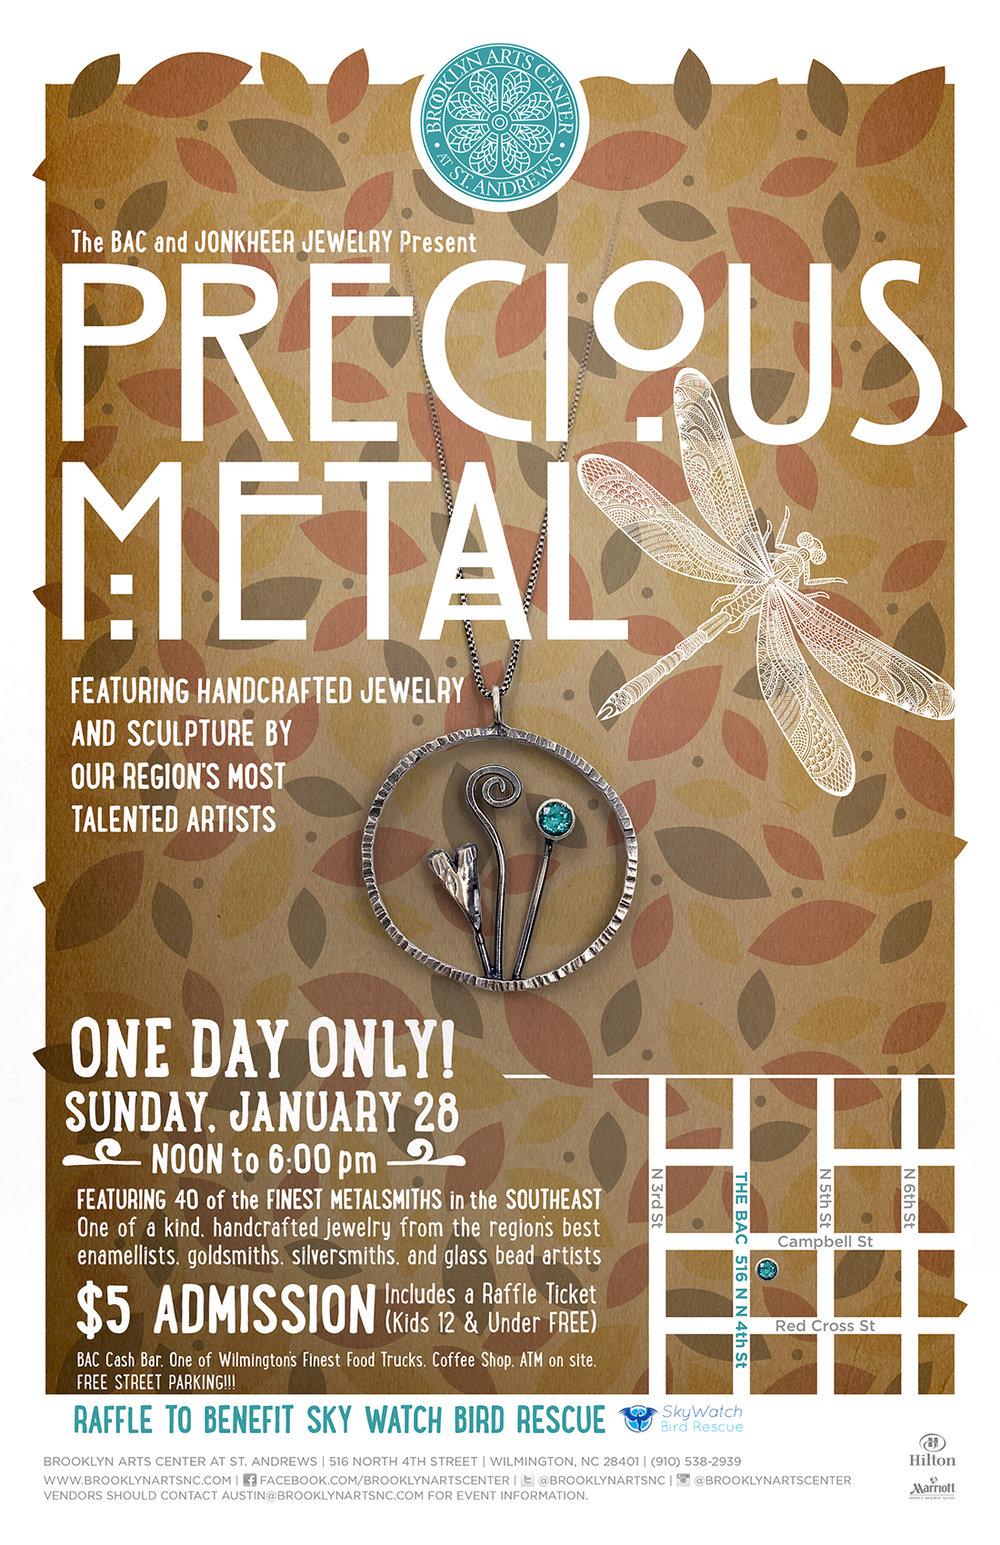 BAC_1946-precious metal-poster3.jpg